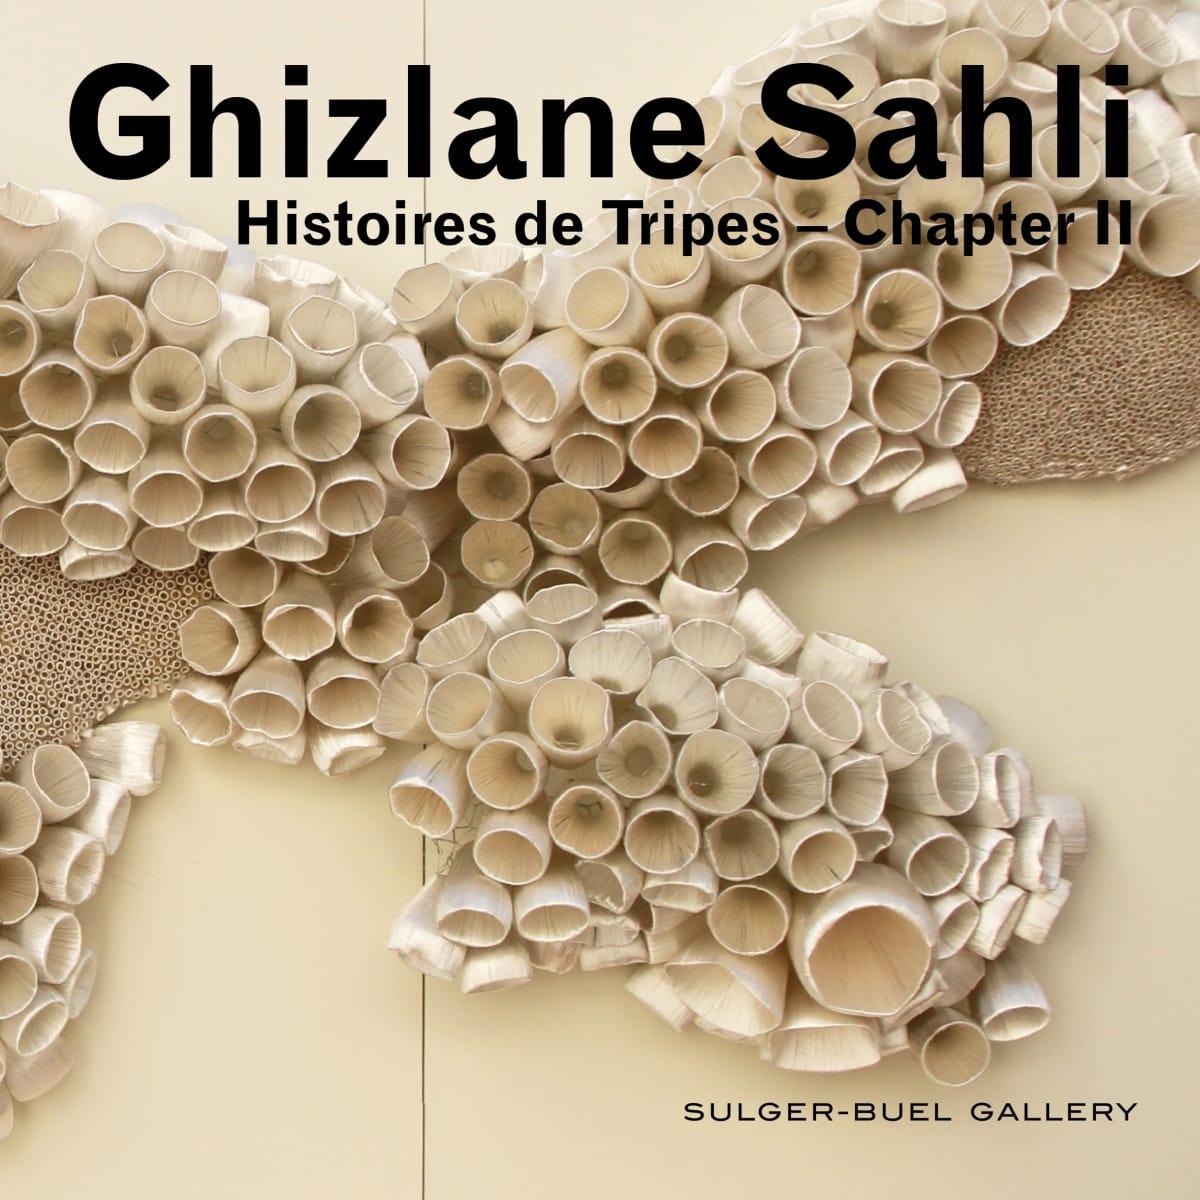 'Histoires De Tripes - Chapter II' Ghizlane Sahli